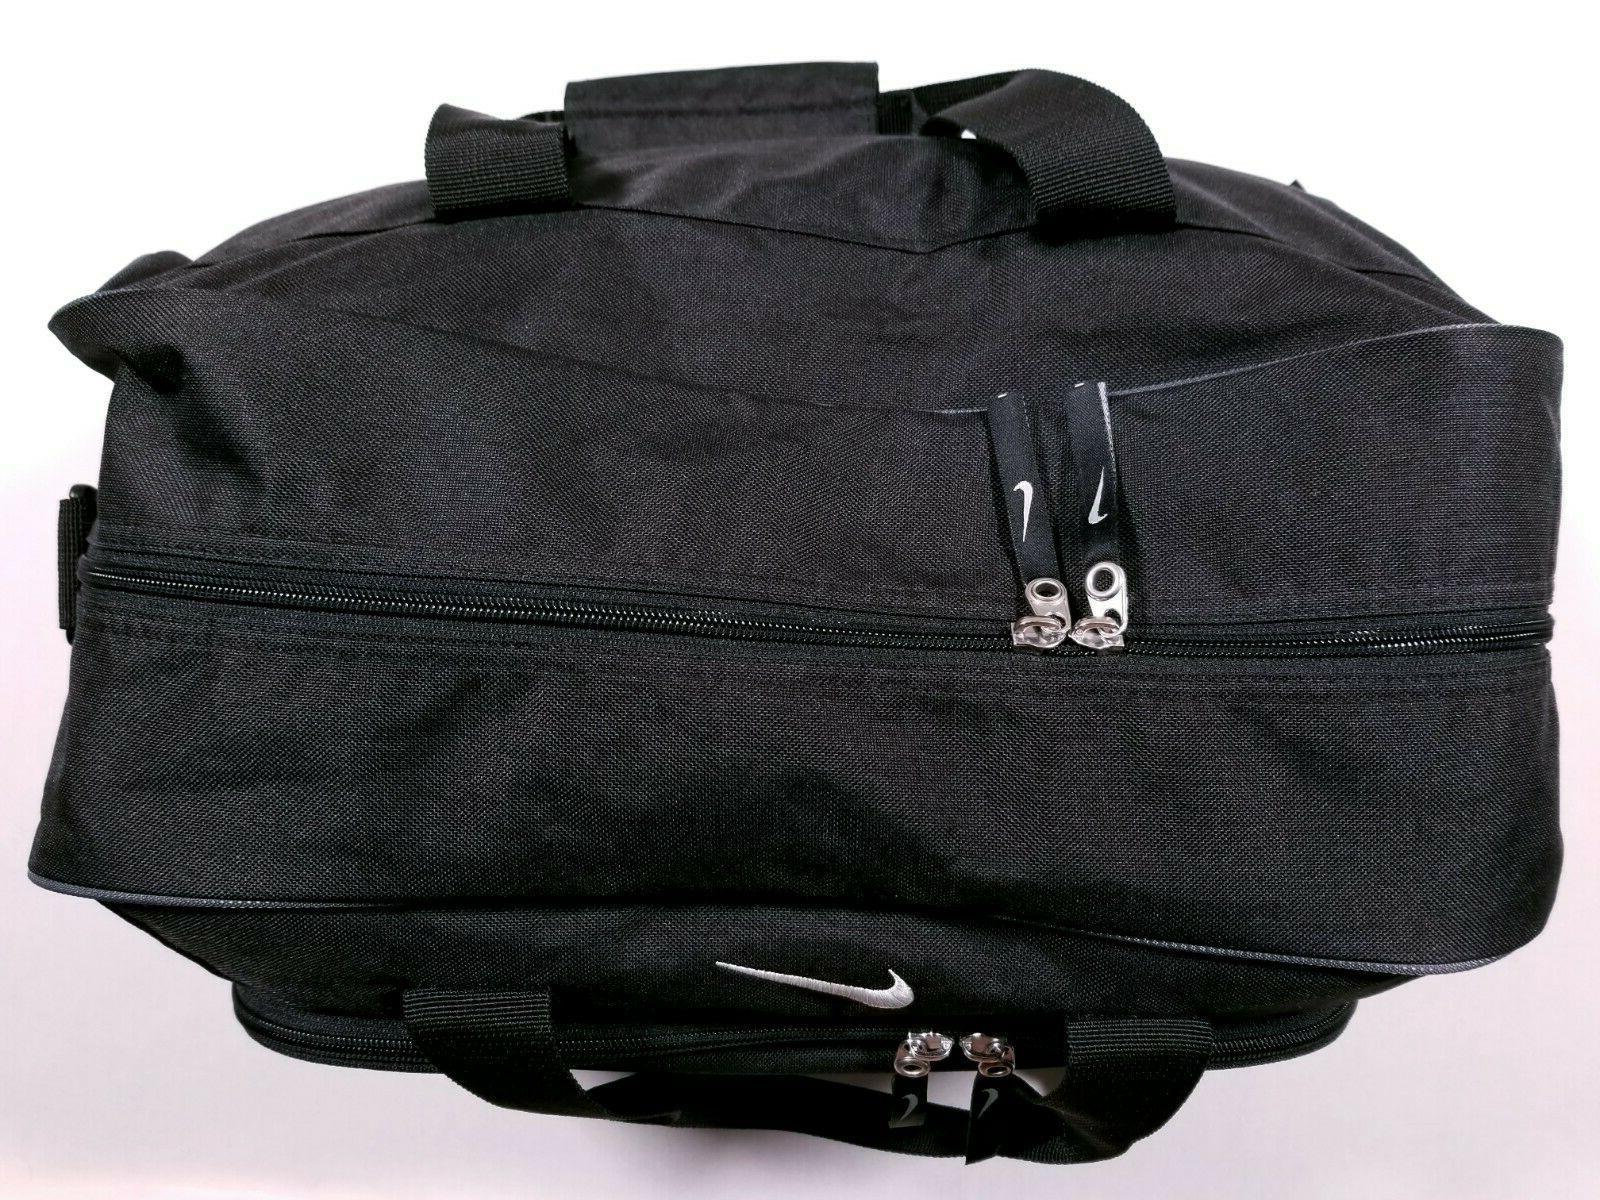 Nike Duffle Bag Shoe Compartment